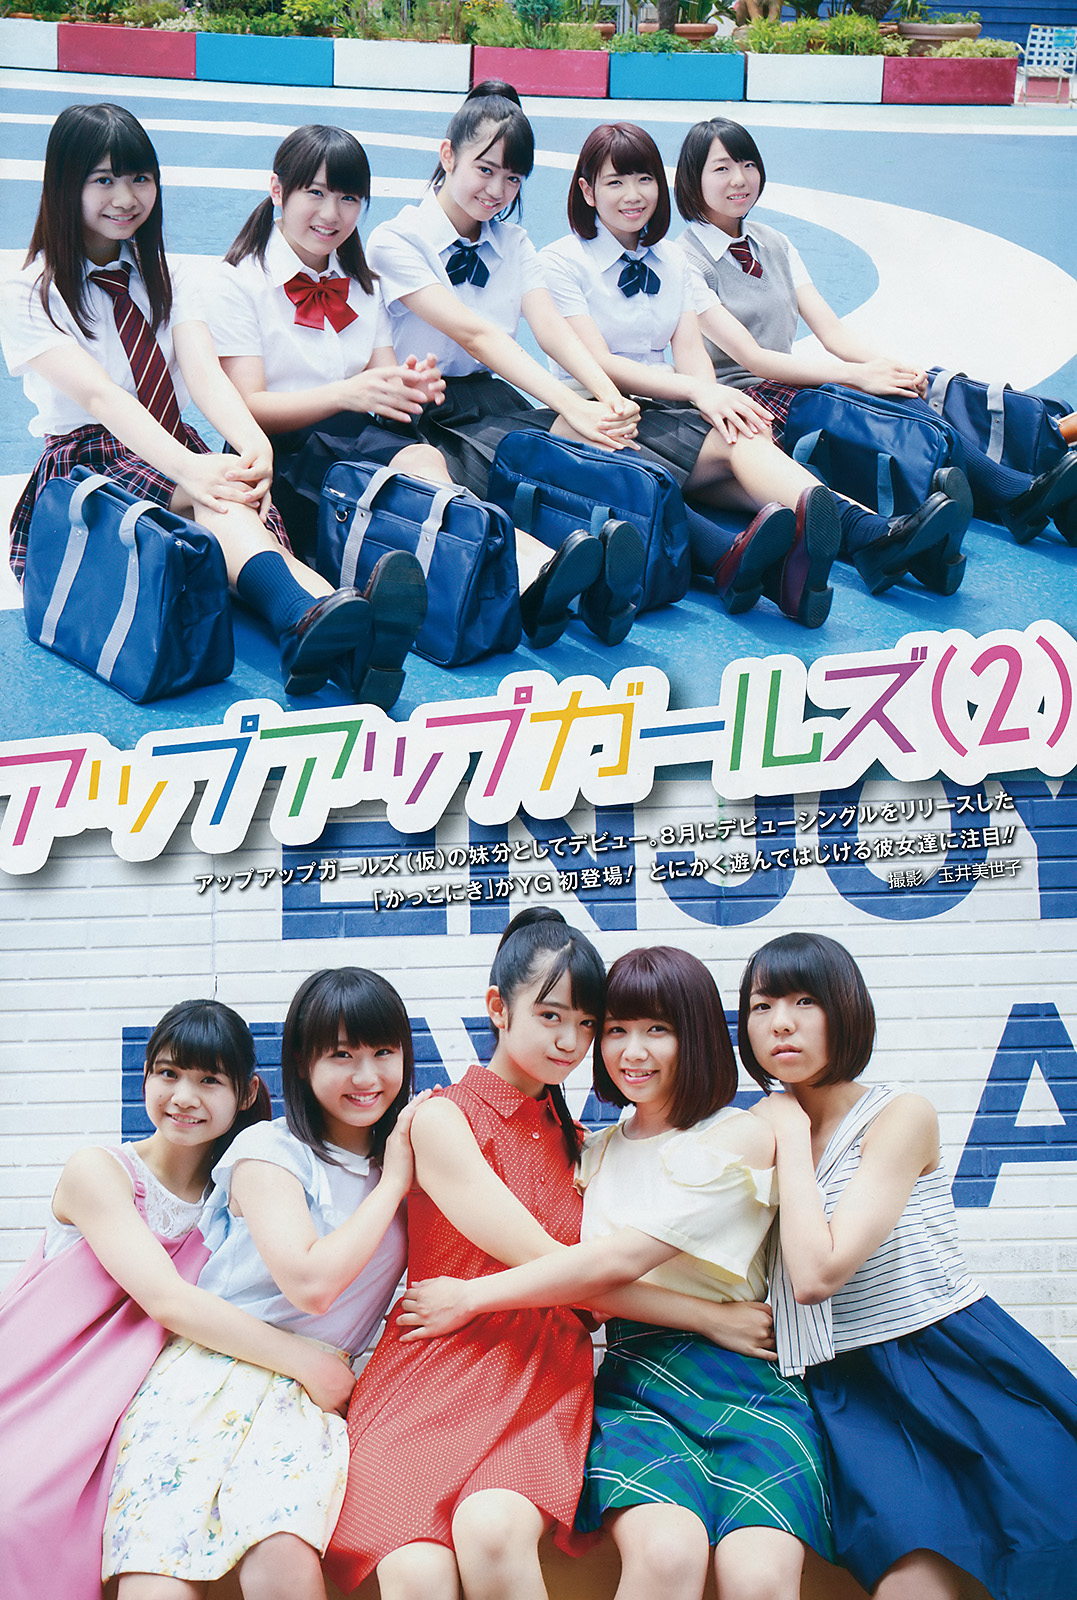 Up Up Girls アップアップガールズ, Young Gangan 2017 No.17 (ヤングガンガン 2017年17号)